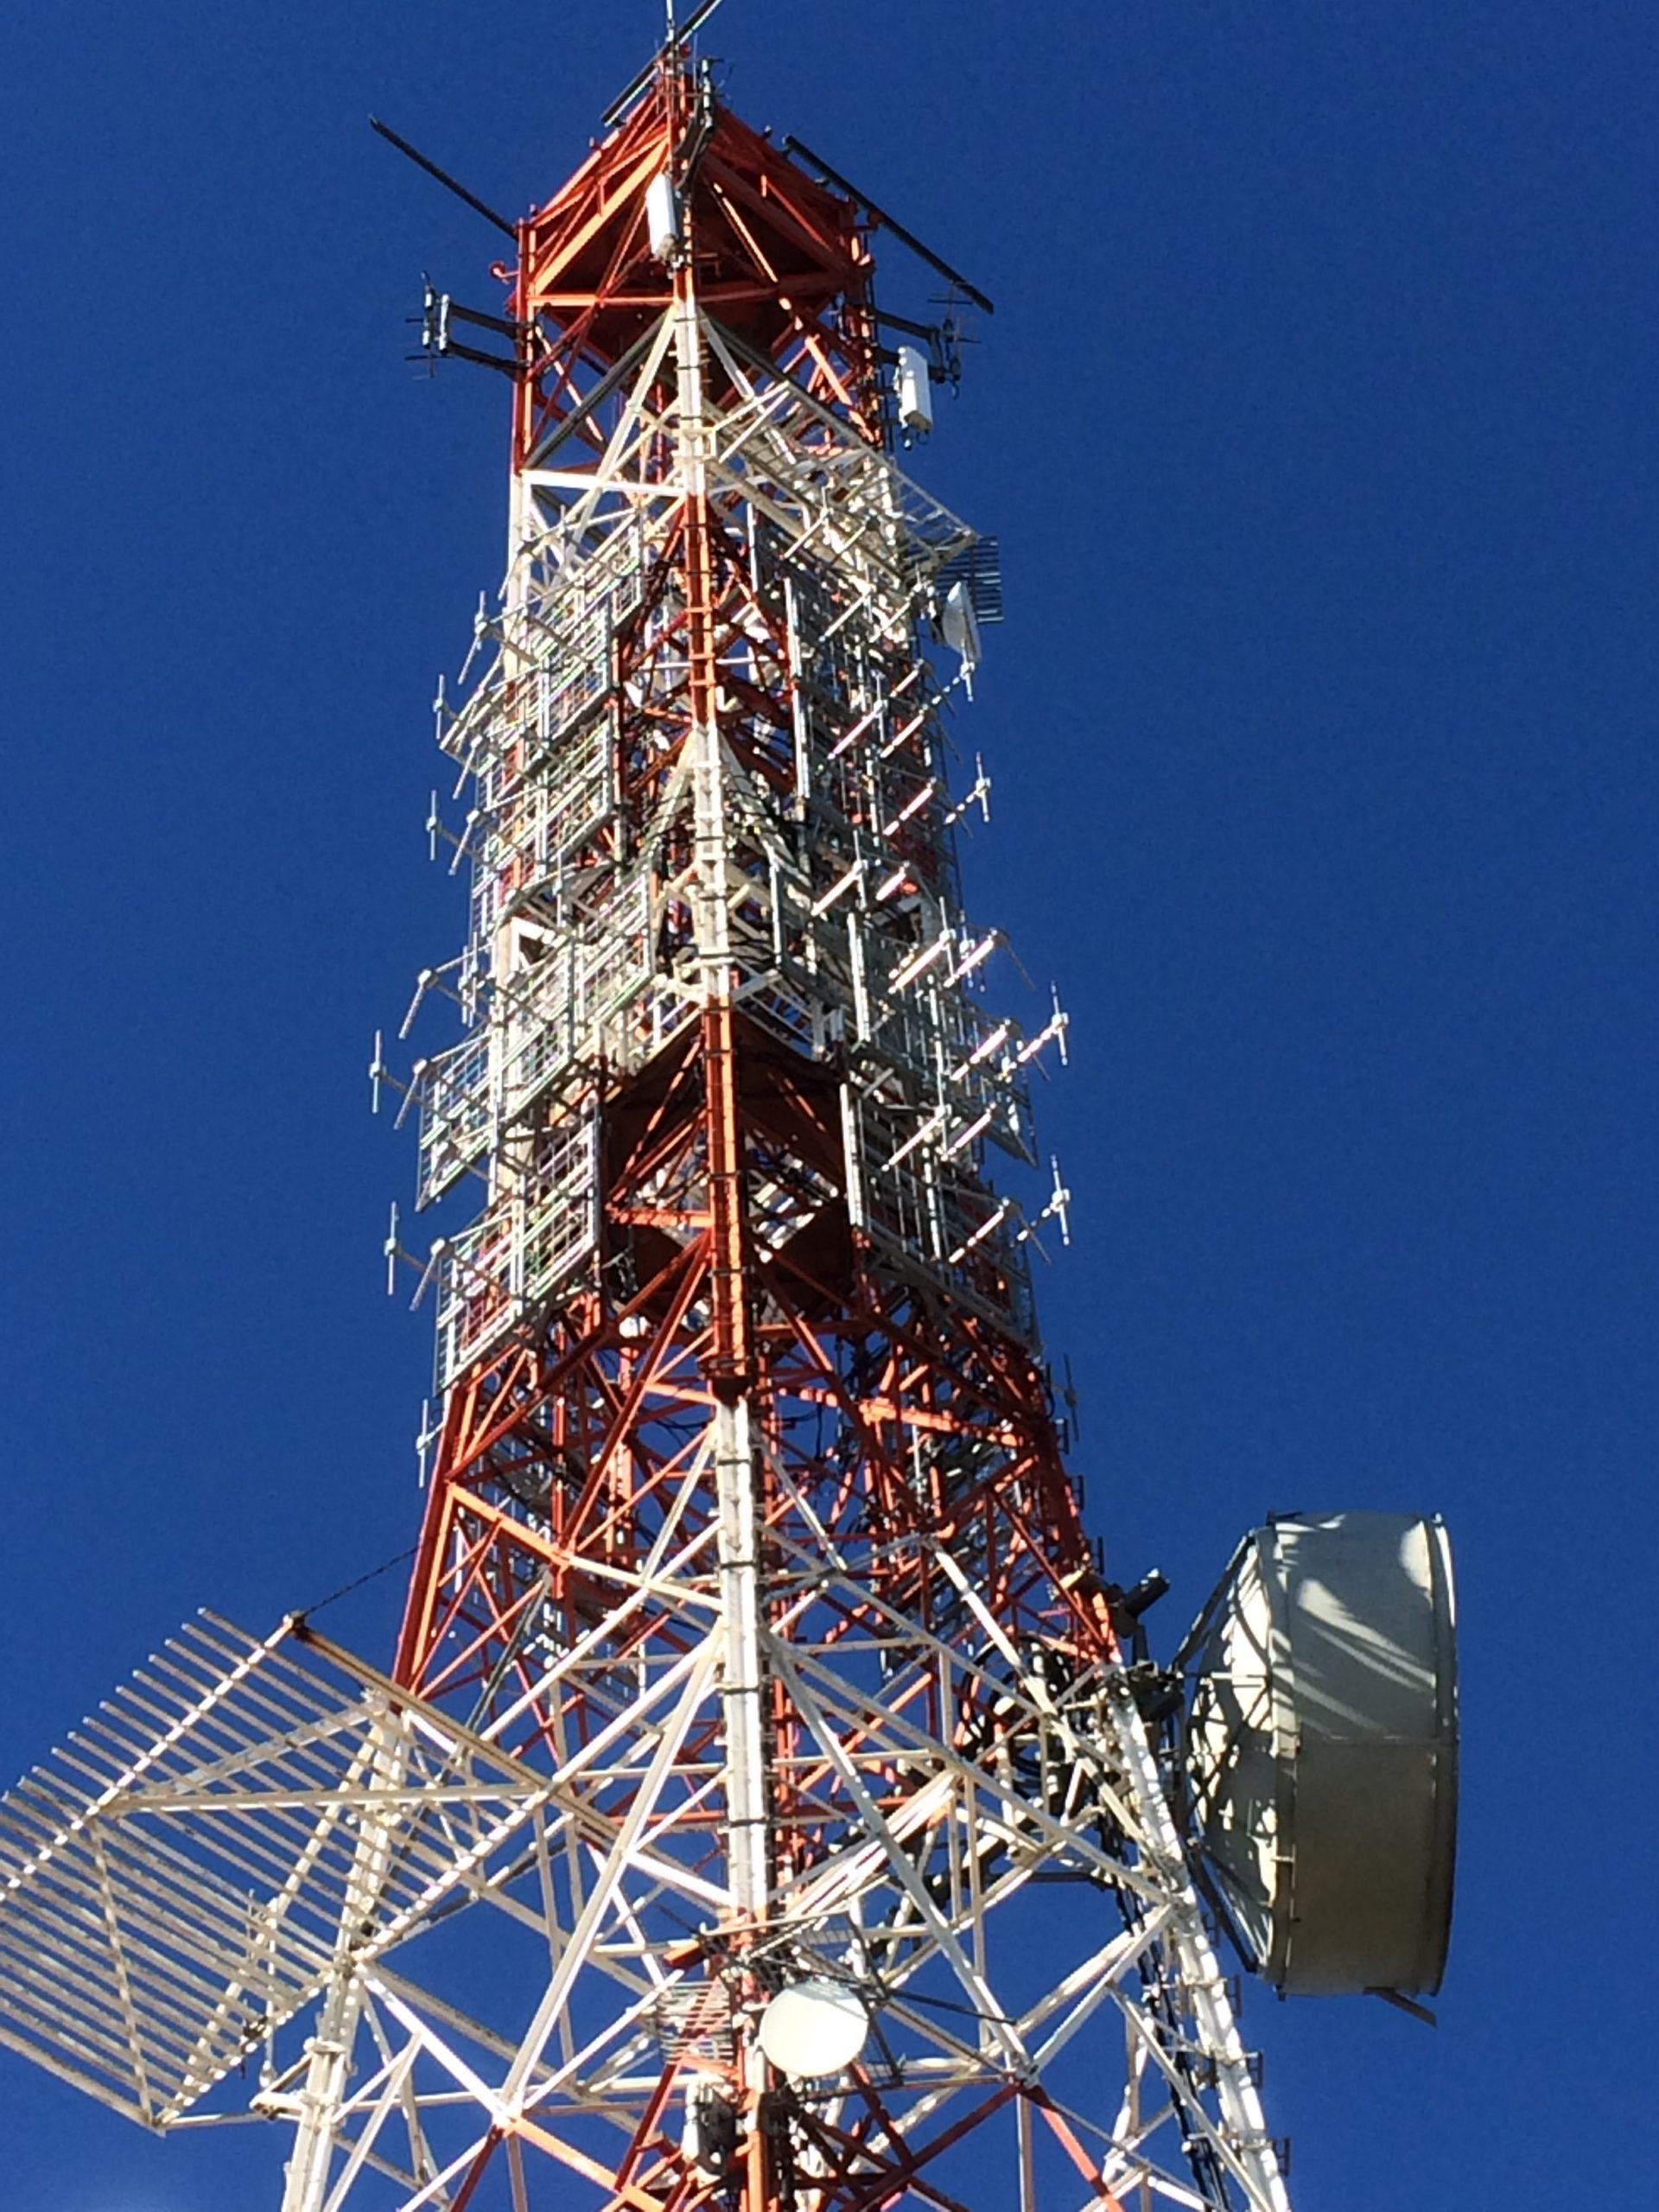 New FM antenna system at Monte Cammarata station, Cammarata, Italy